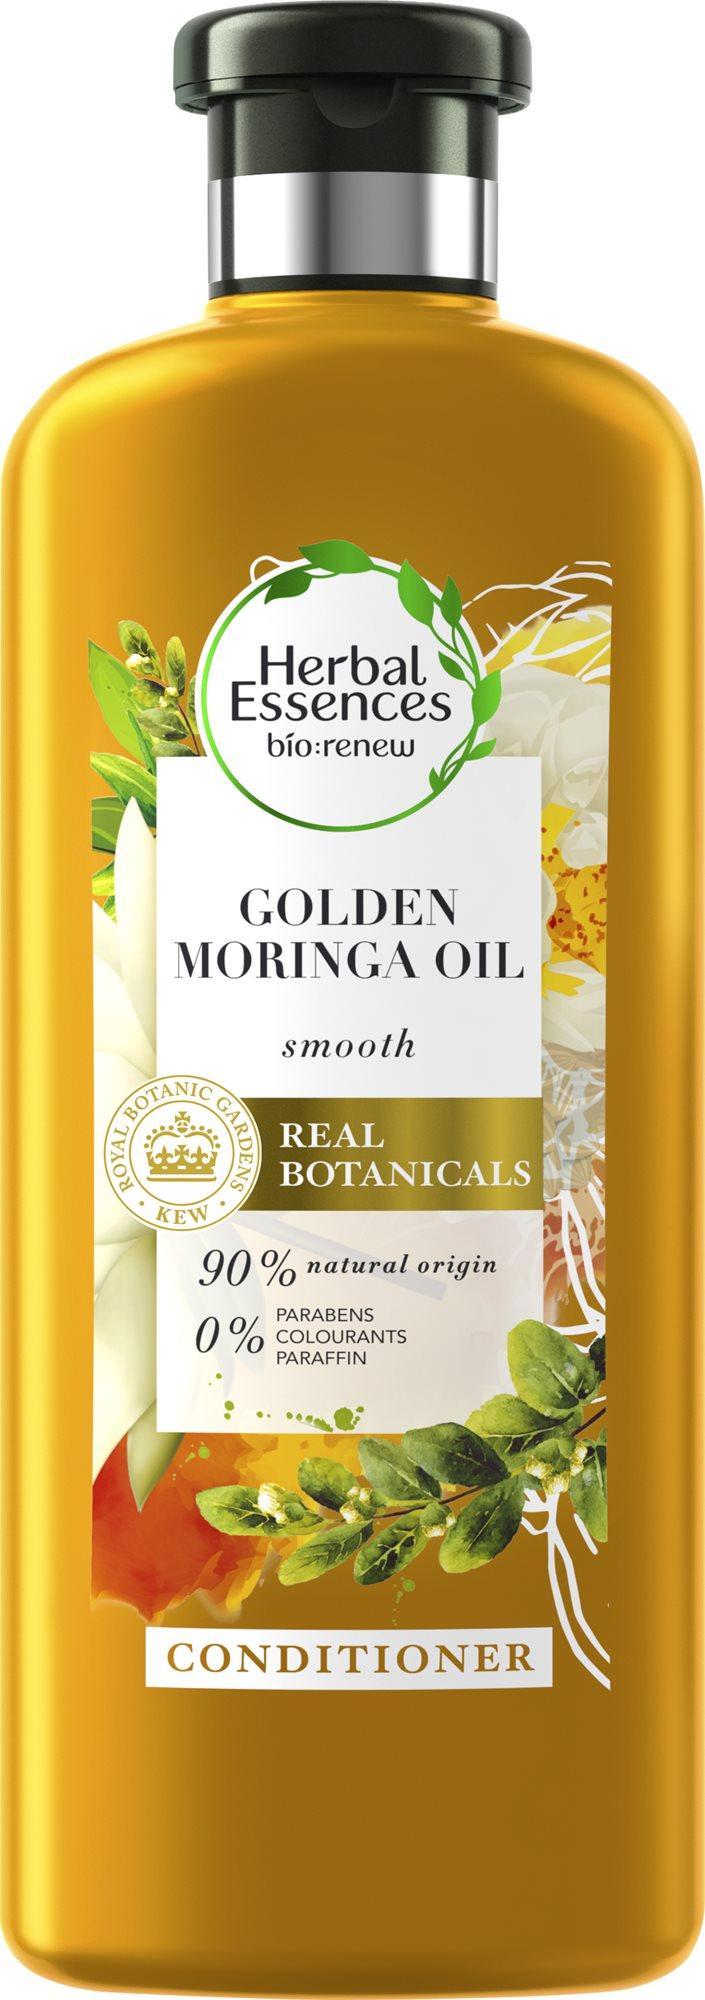 Herbal Essence Smooth Golden Moringa 360 ml